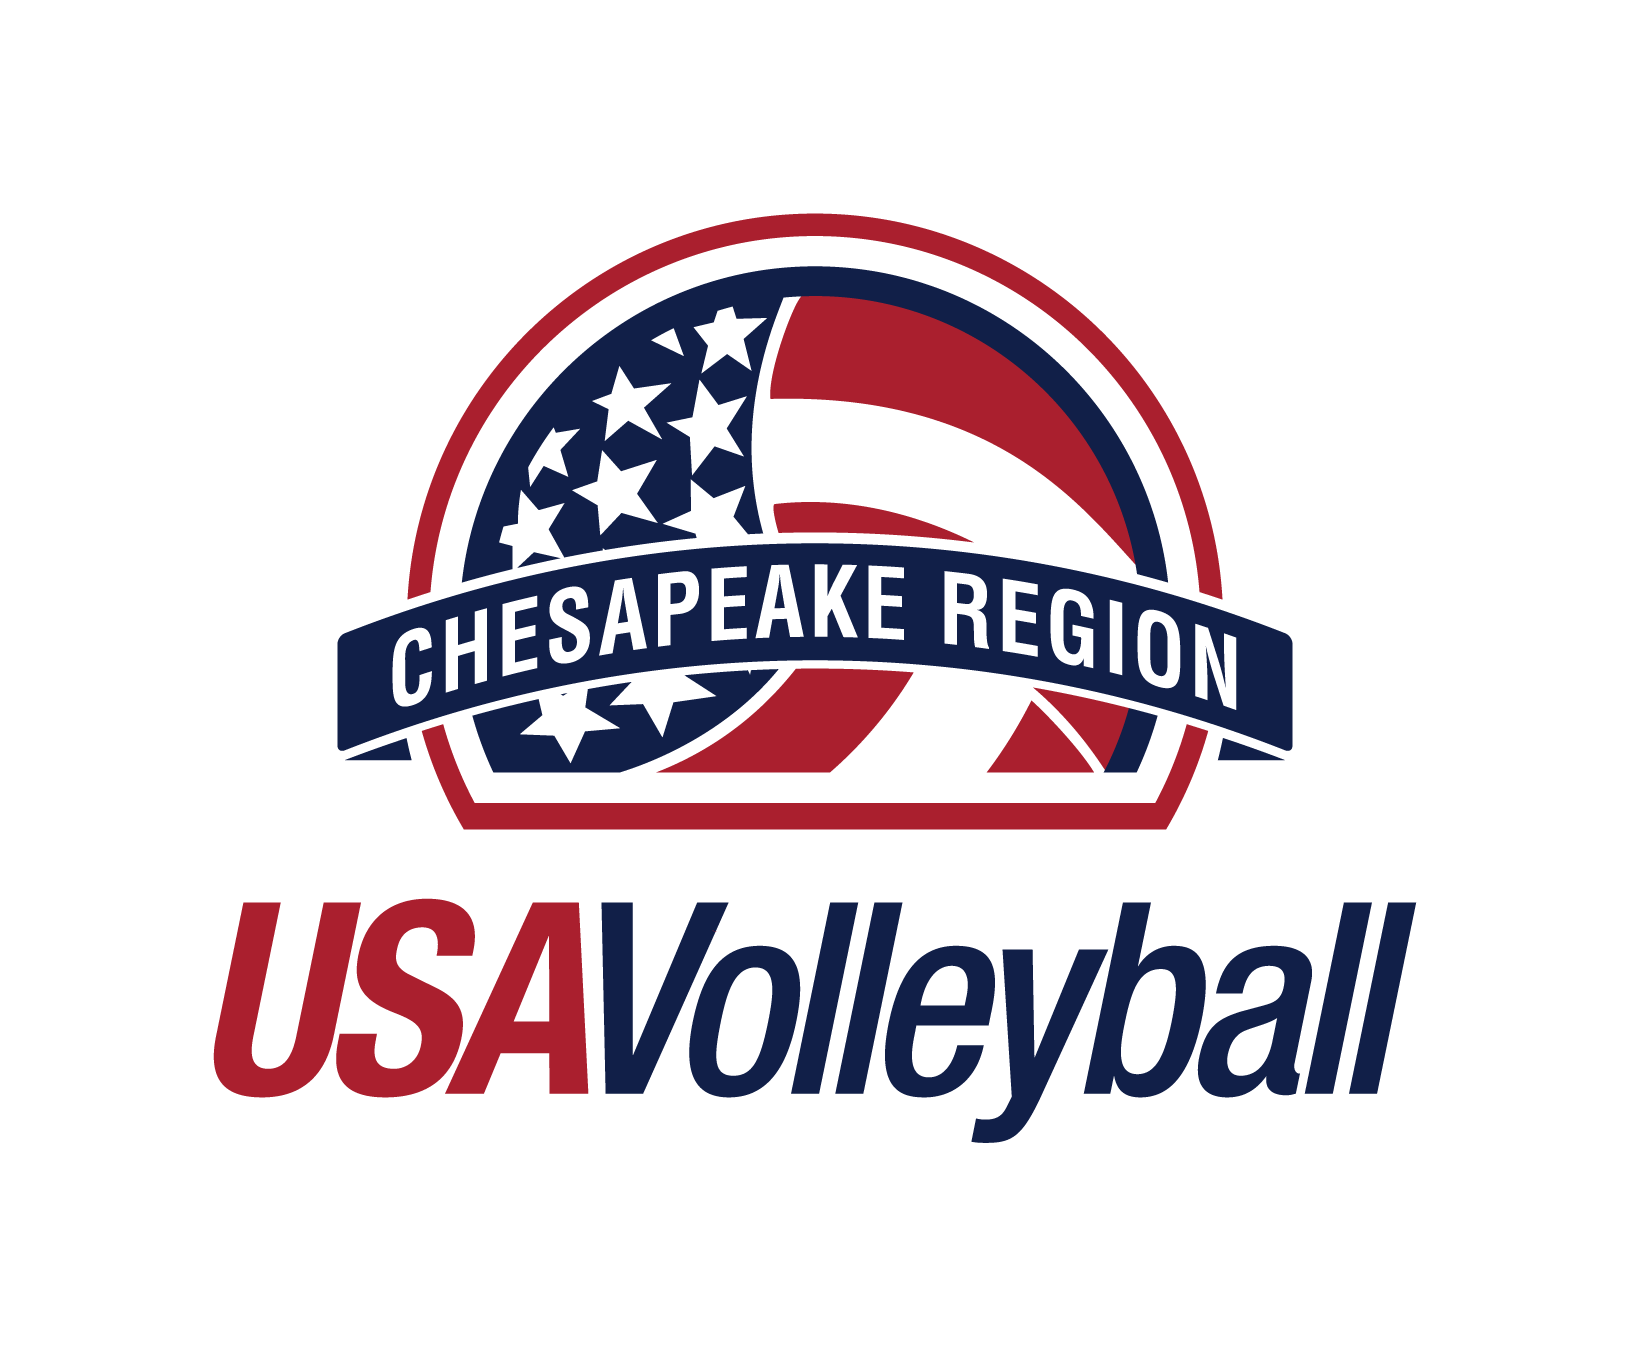 Chesapeake Region logo